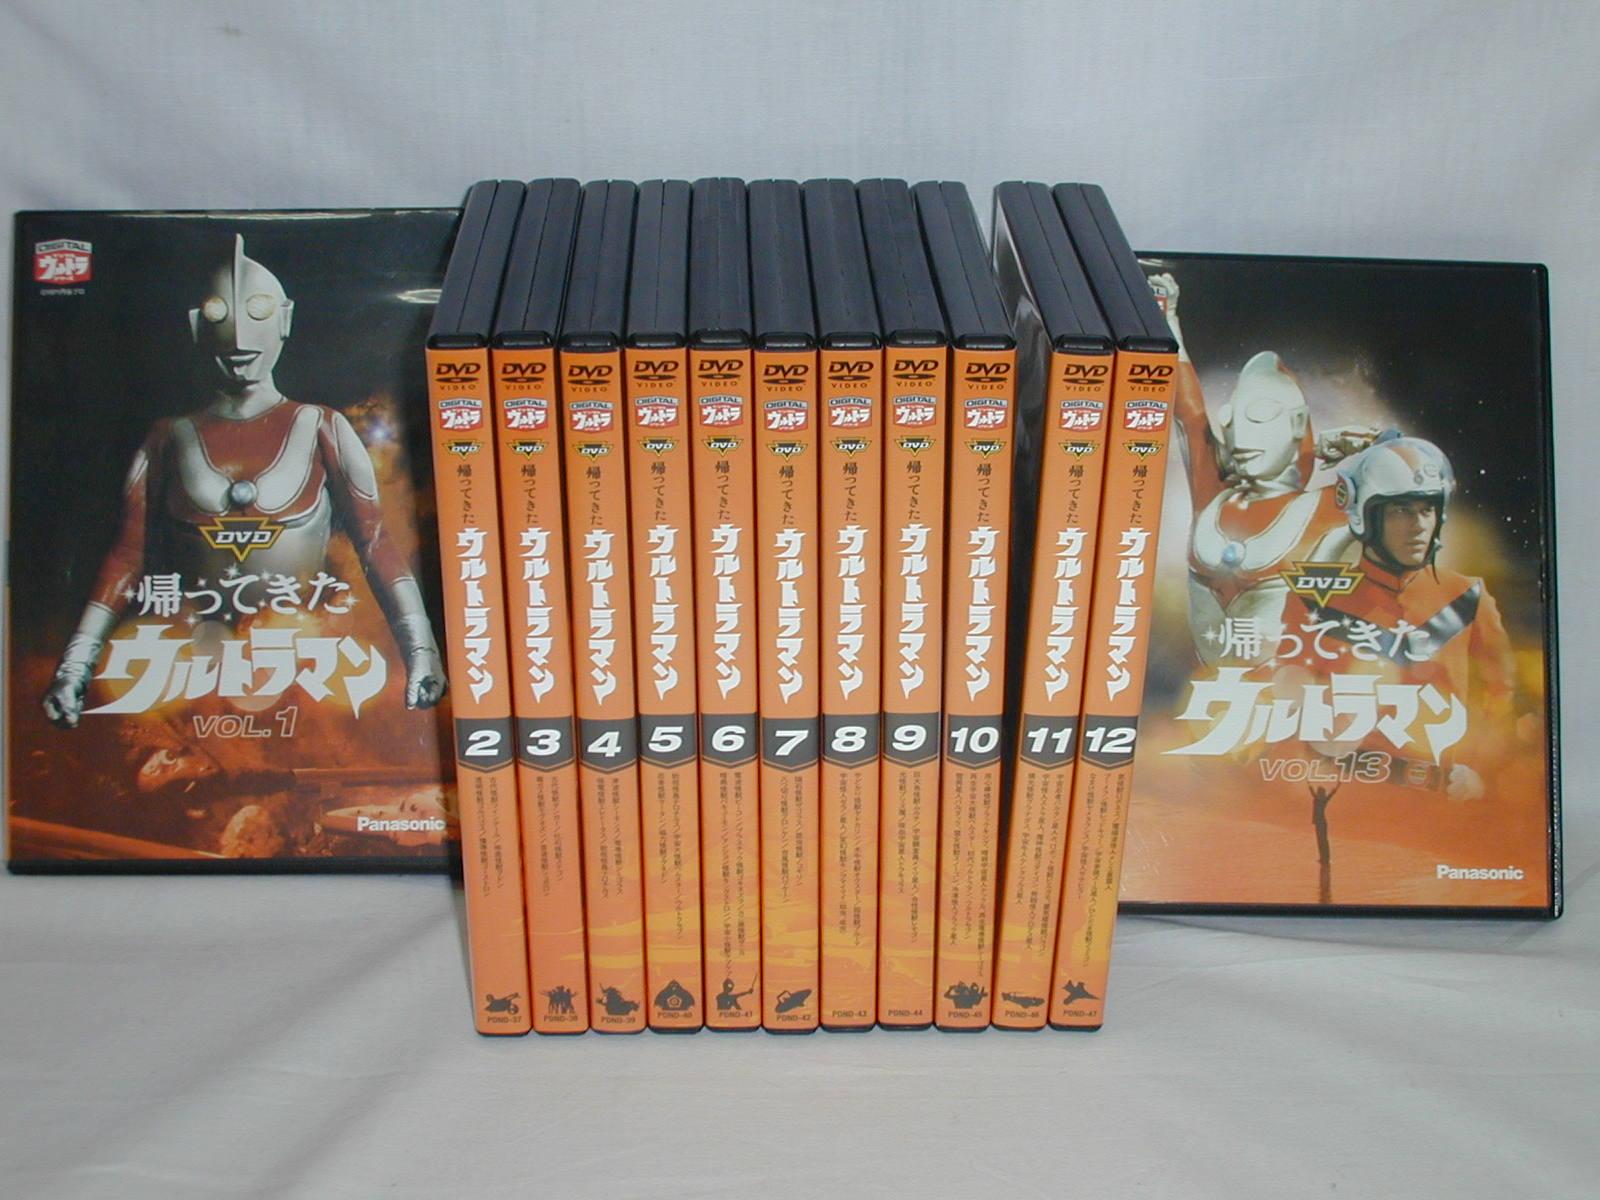 (DVD)帰ってきたウルトラマン  Vol.1〜13 全13巻セット【中古】:TSK e−SHOP